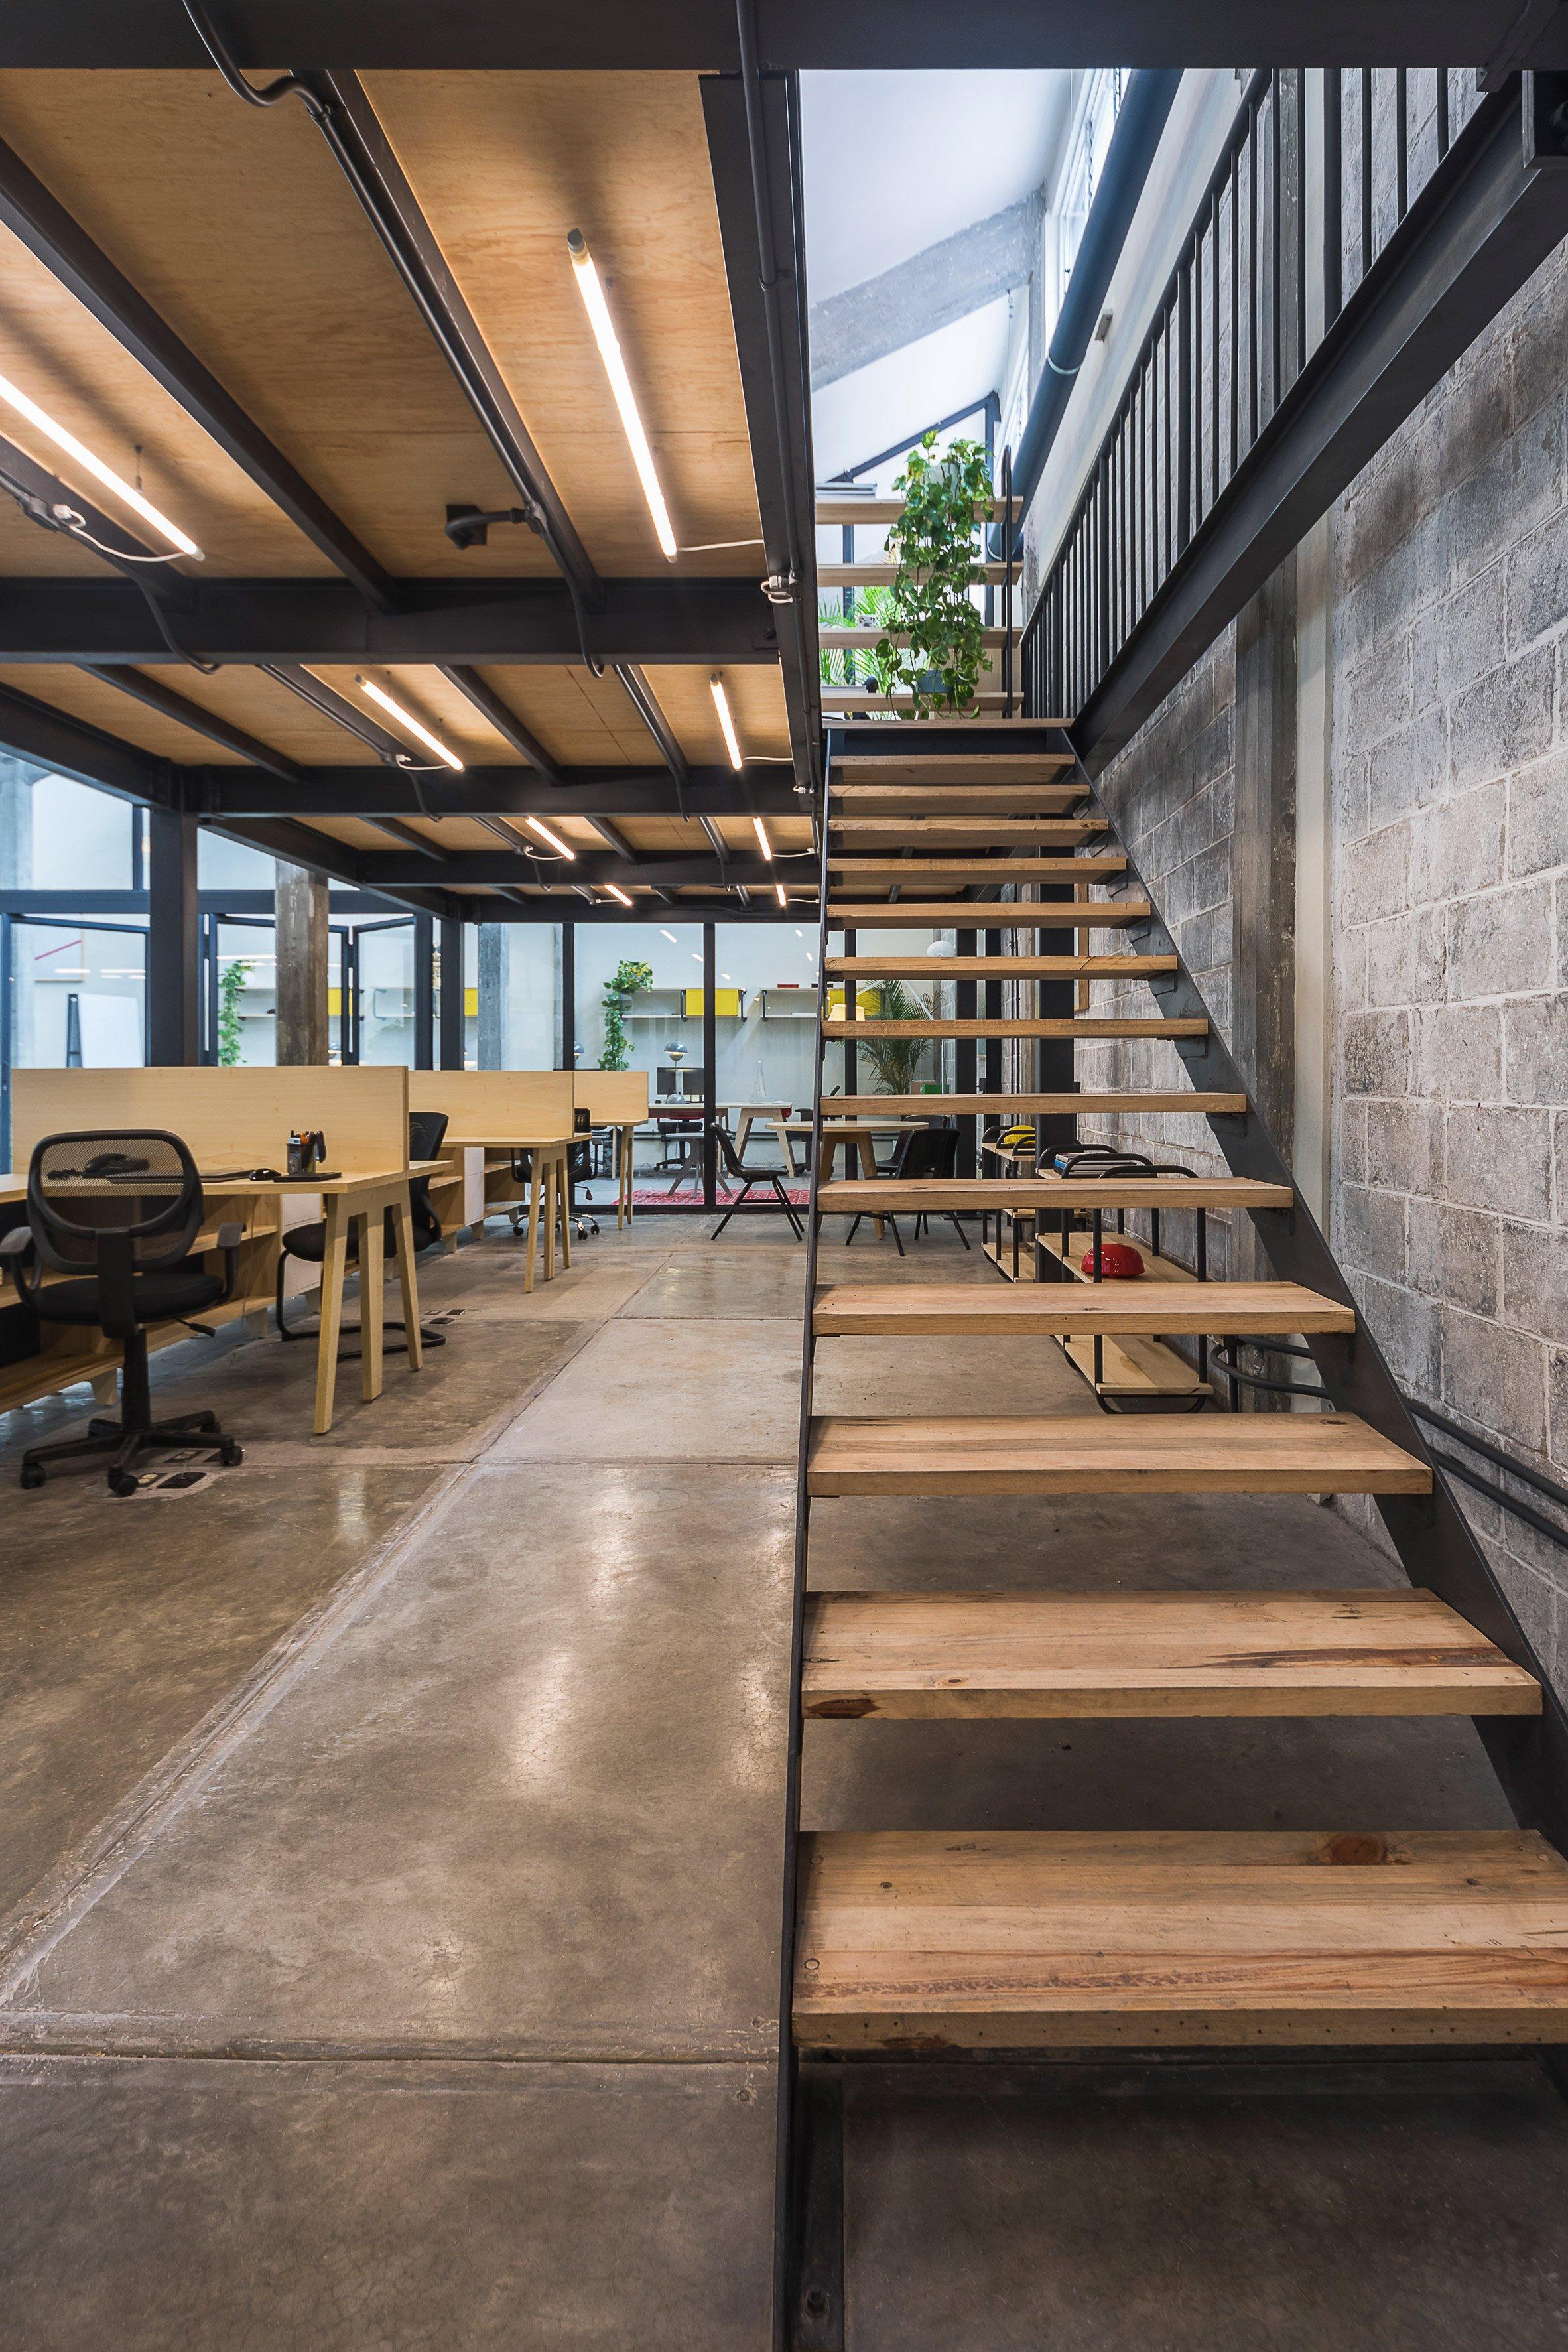 Guateque offices by Estudio Atemporal